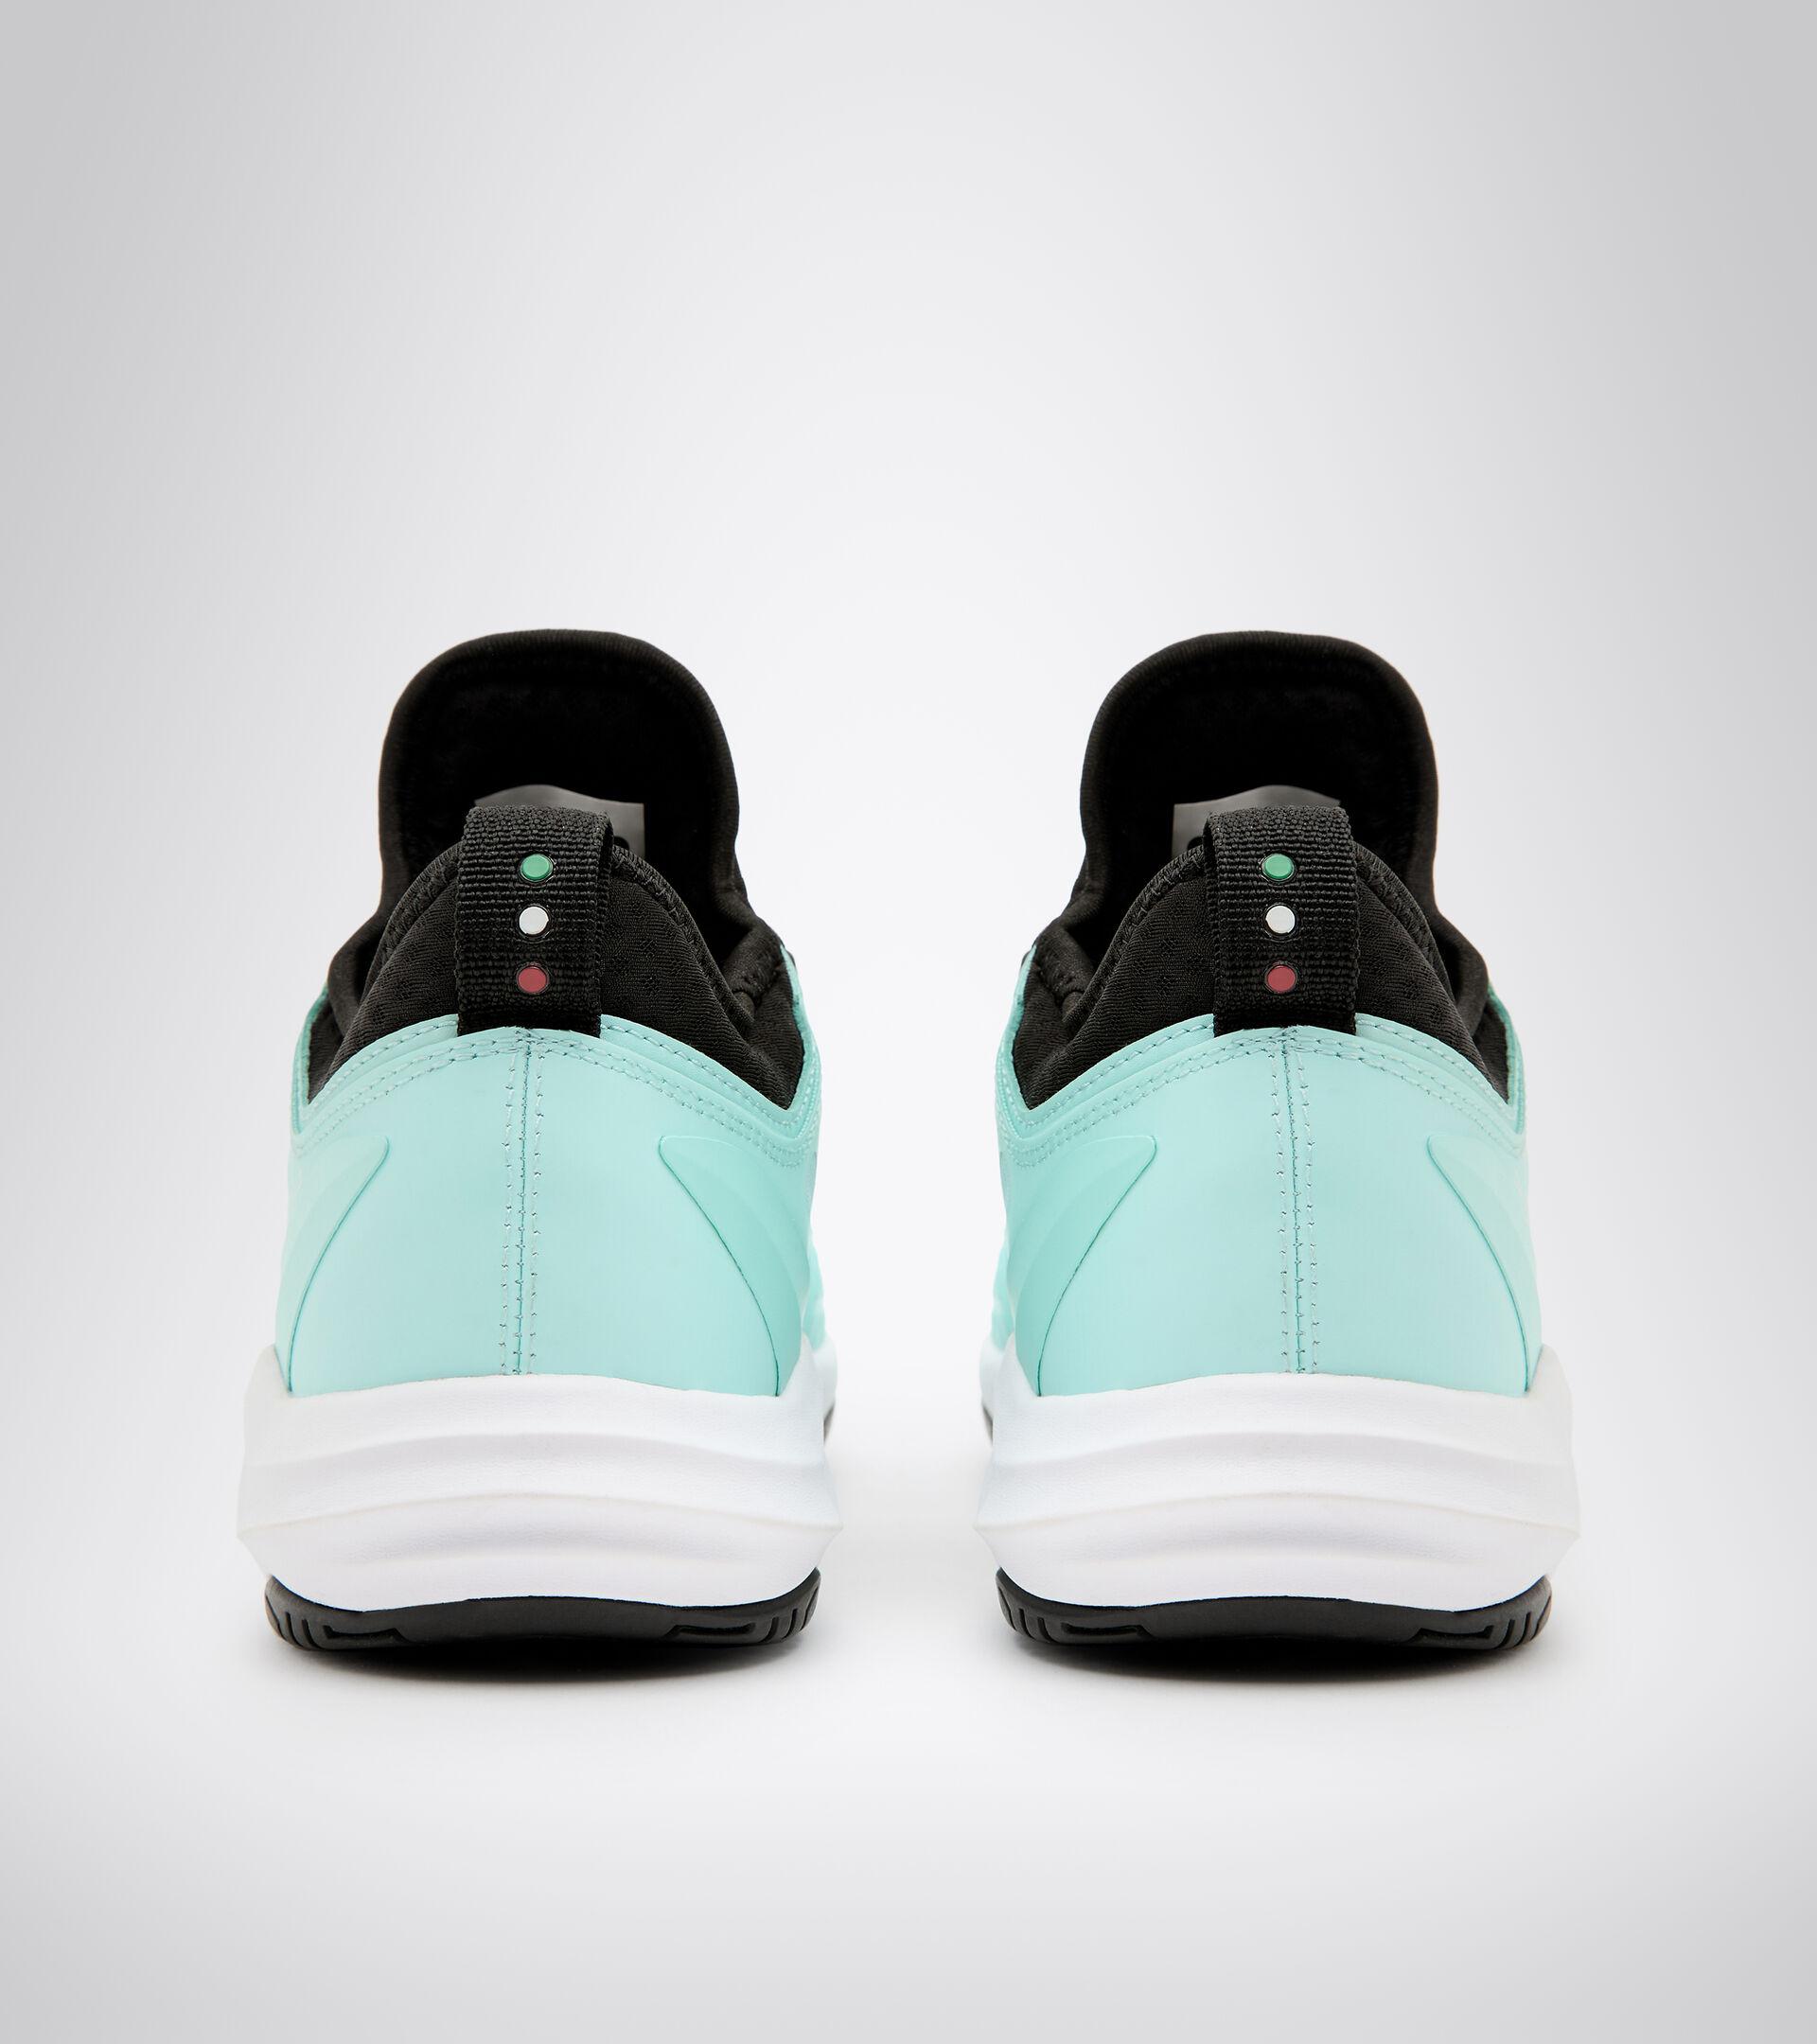 Footwear Sport DONNA SPEED BLUSHIELD FLY 3 + W AG AZZURRO TINTA/NERO/BIANCO Diadora